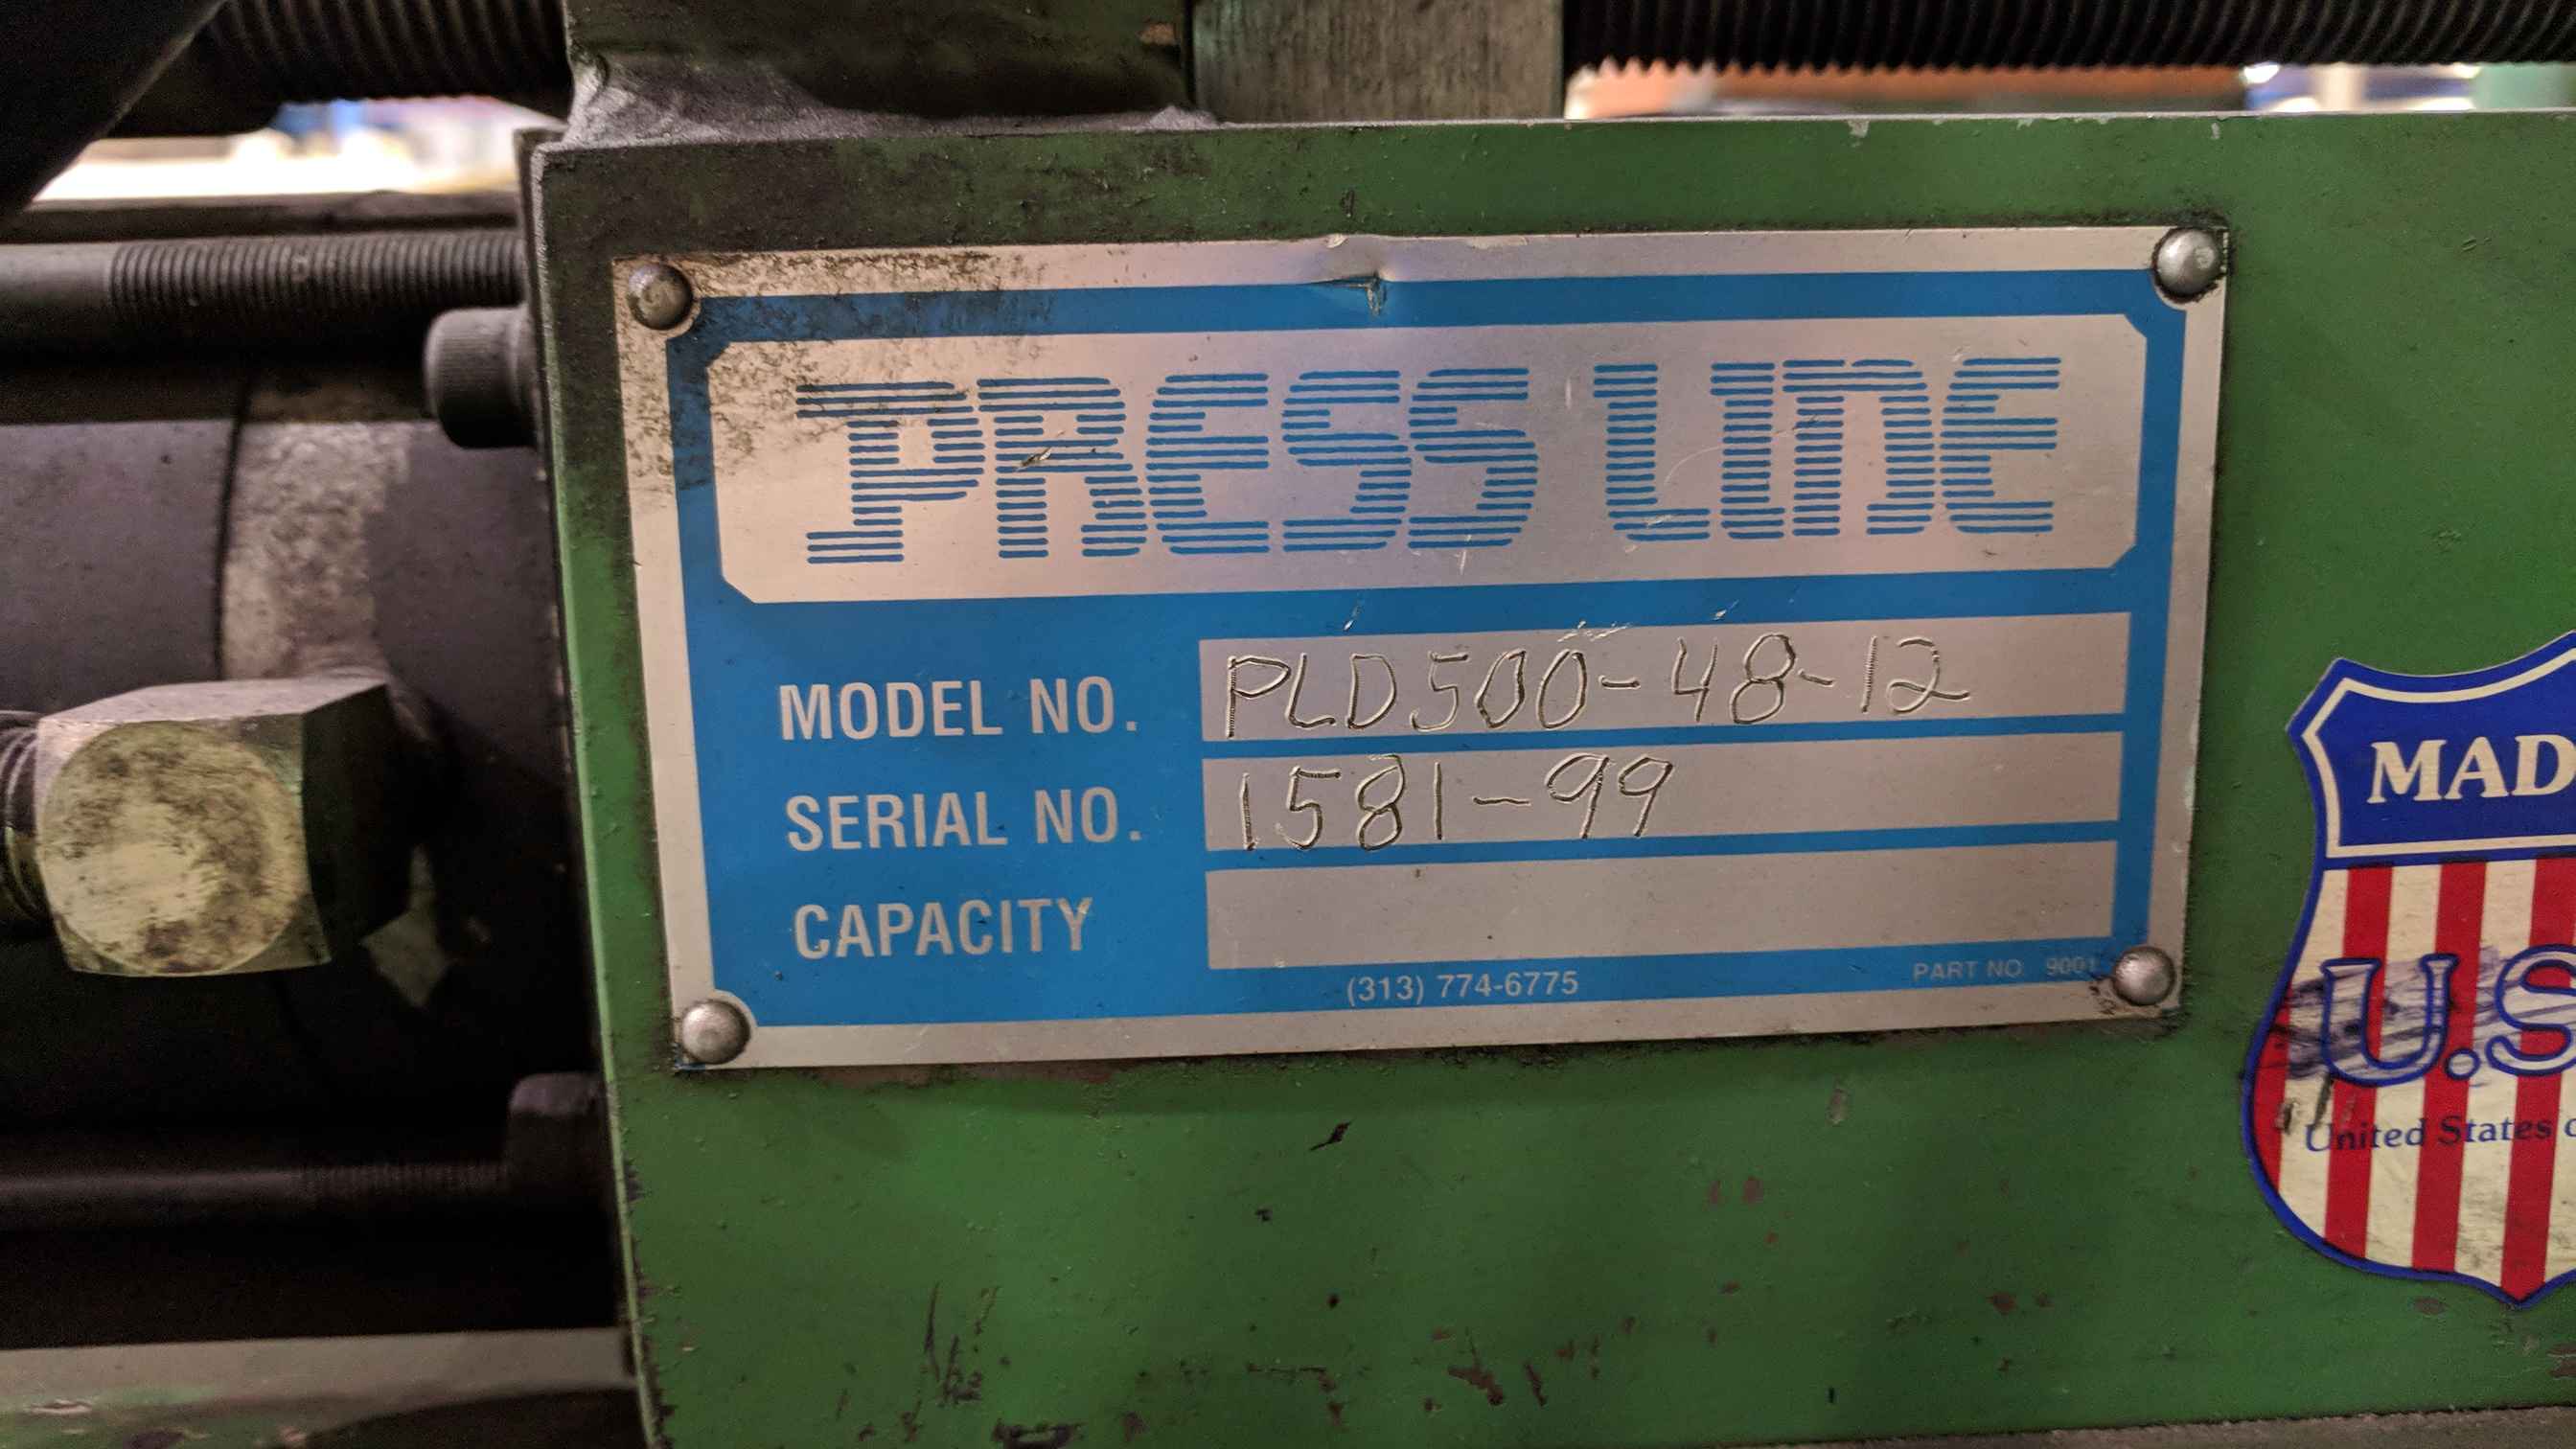 "PRESS LINE (1999) PLD500-48-12 48"" STRAIGHTENER-FEEDER, S/N 1581-99 - Image 2 of 5"